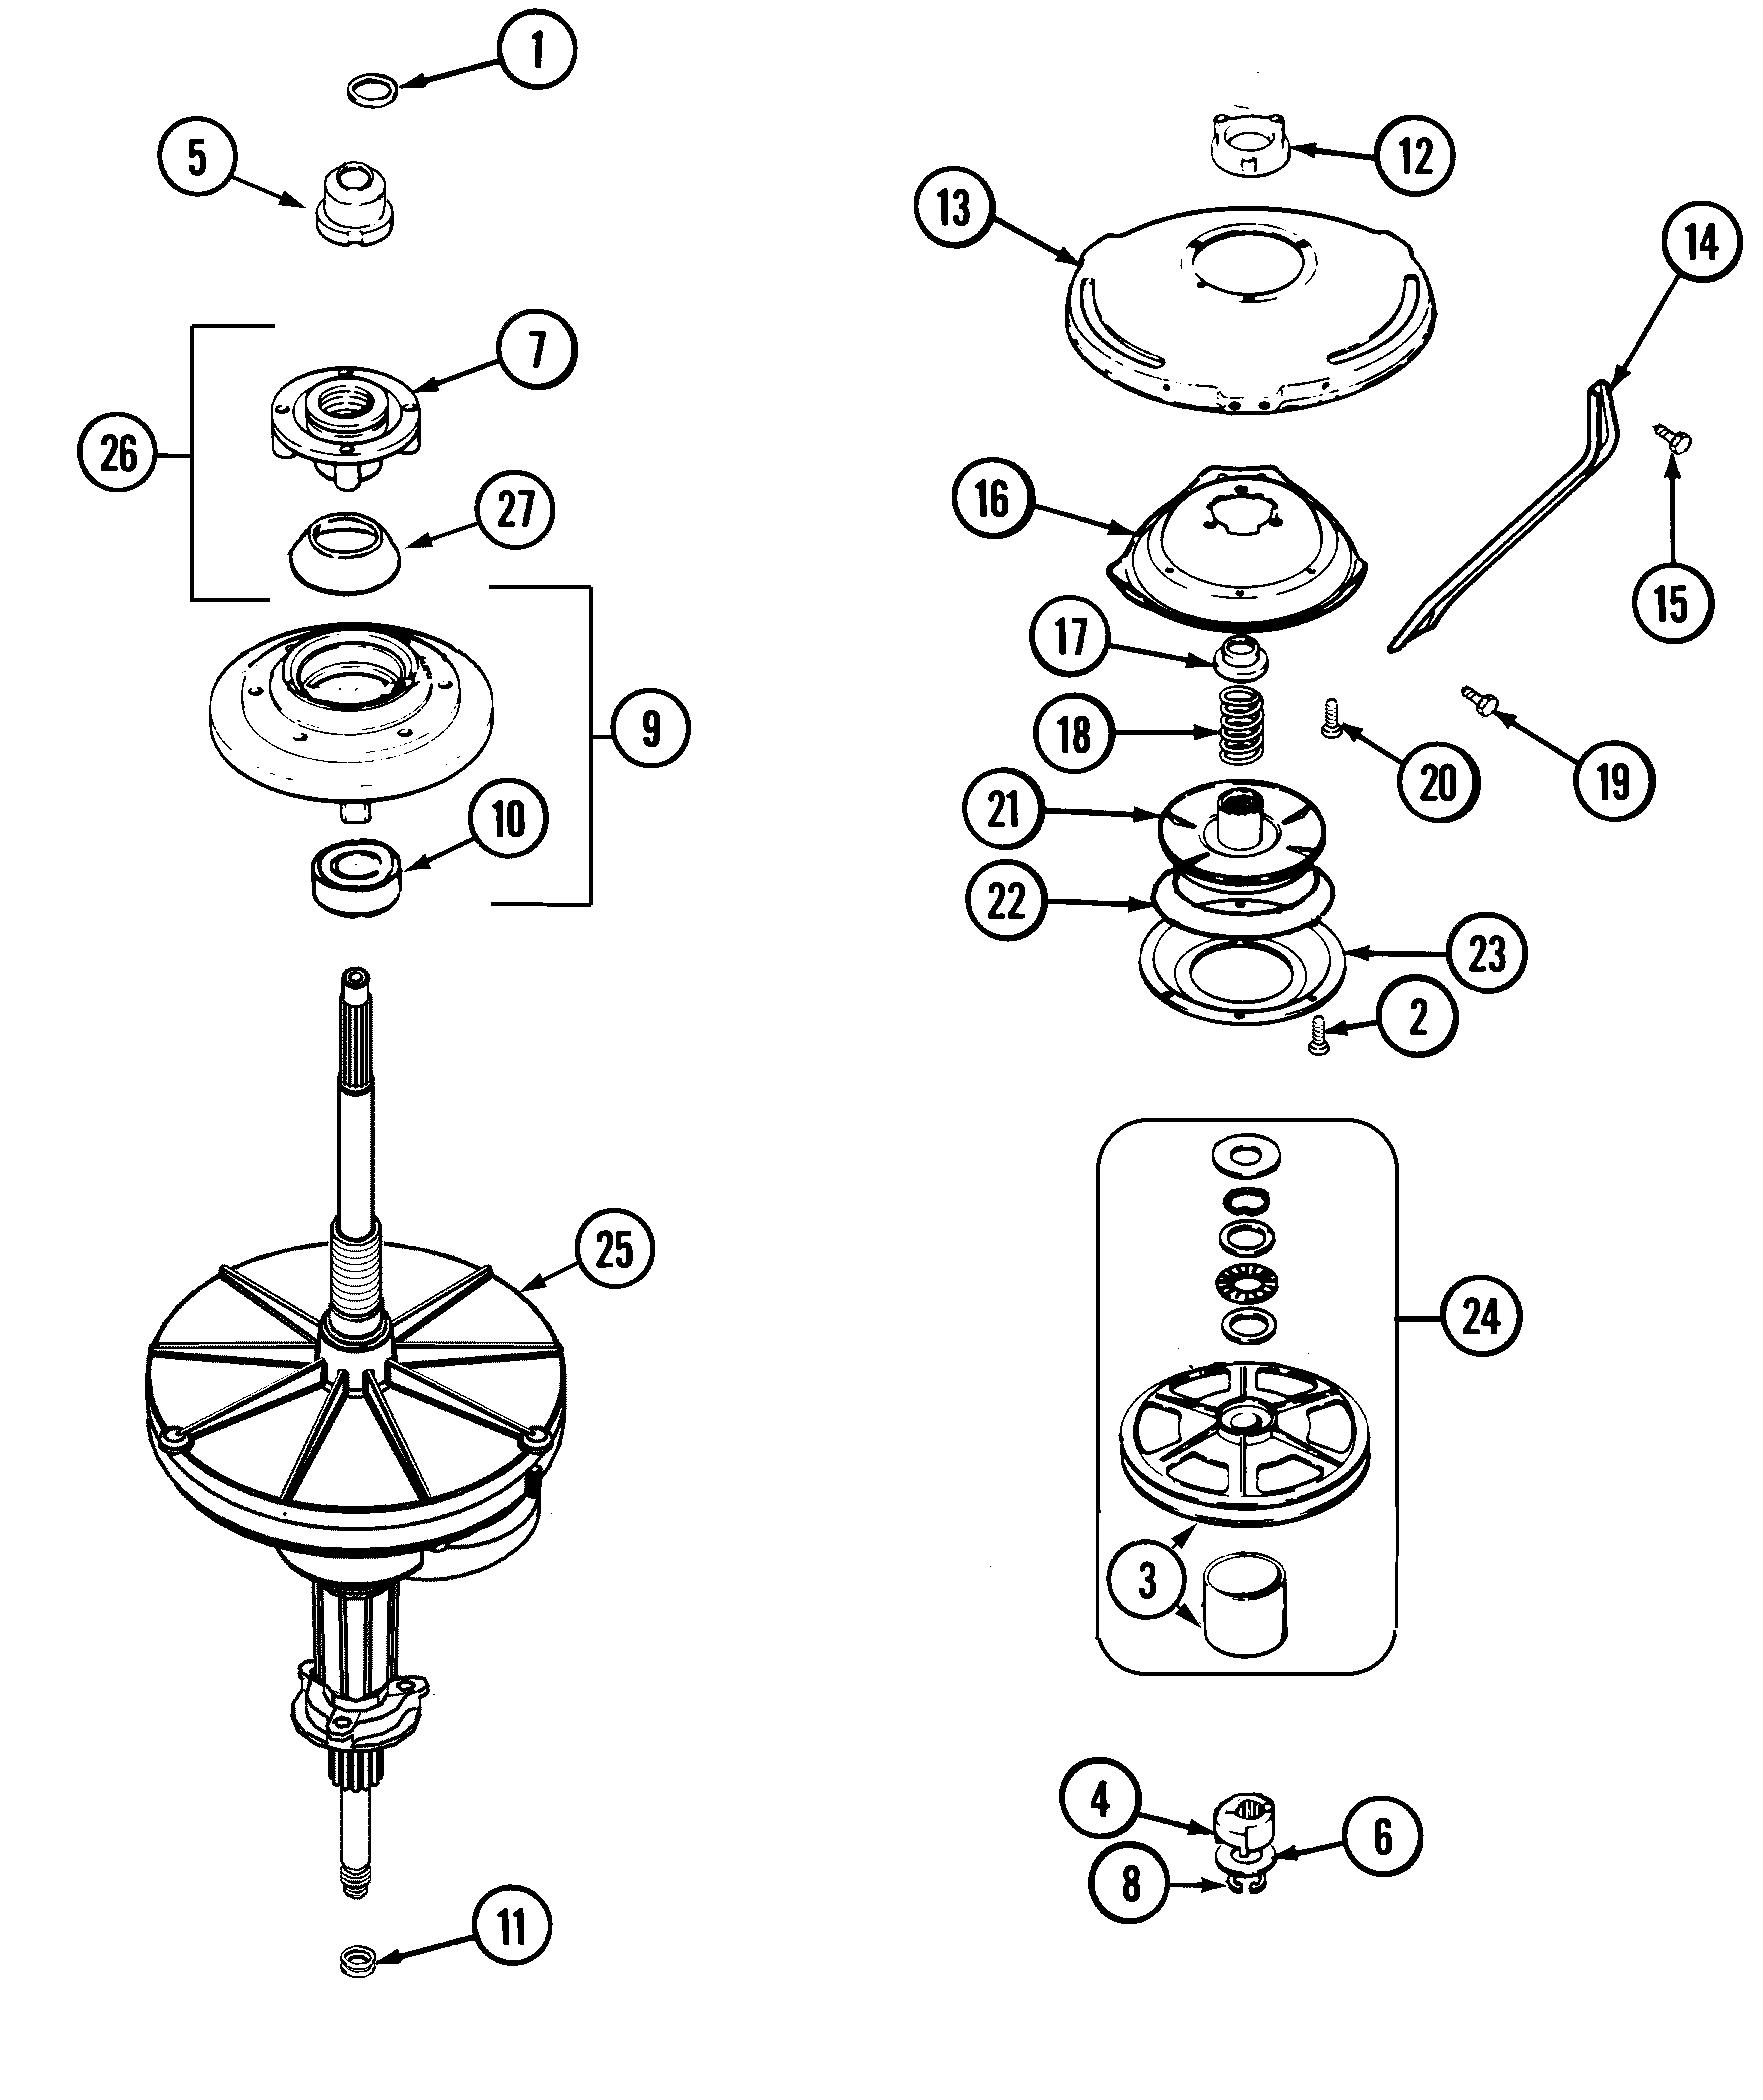 hight resolution of maytag model mav7600aww residential washers genuine parts maytag bravos washer wiring diagrams maytag washer diagram